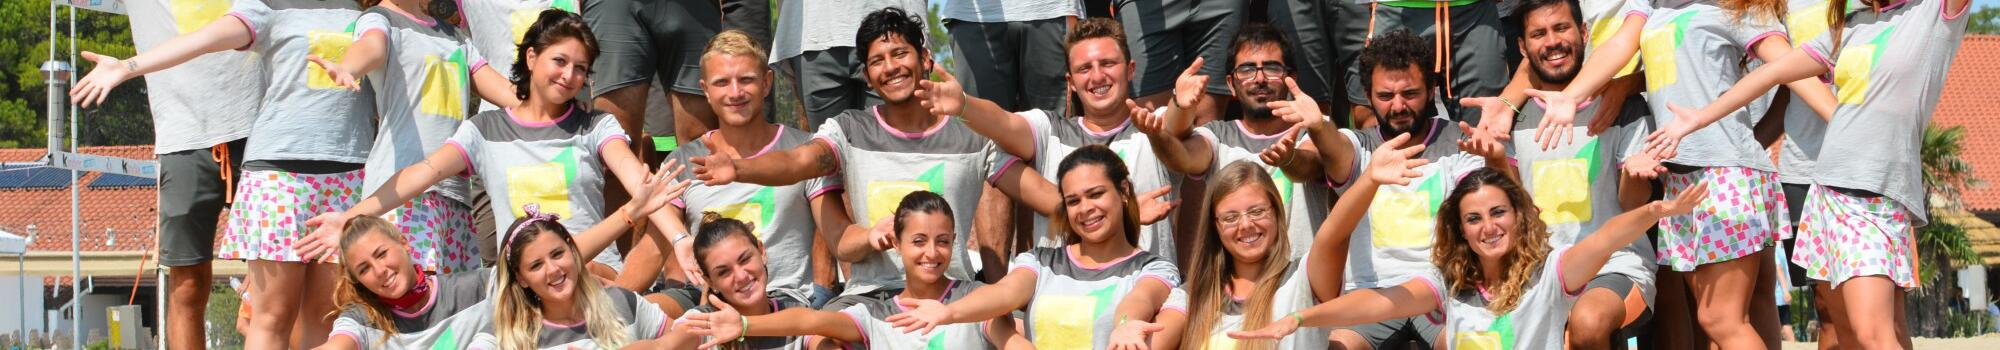 Capalonga Experience: SPASS UND EVENTS